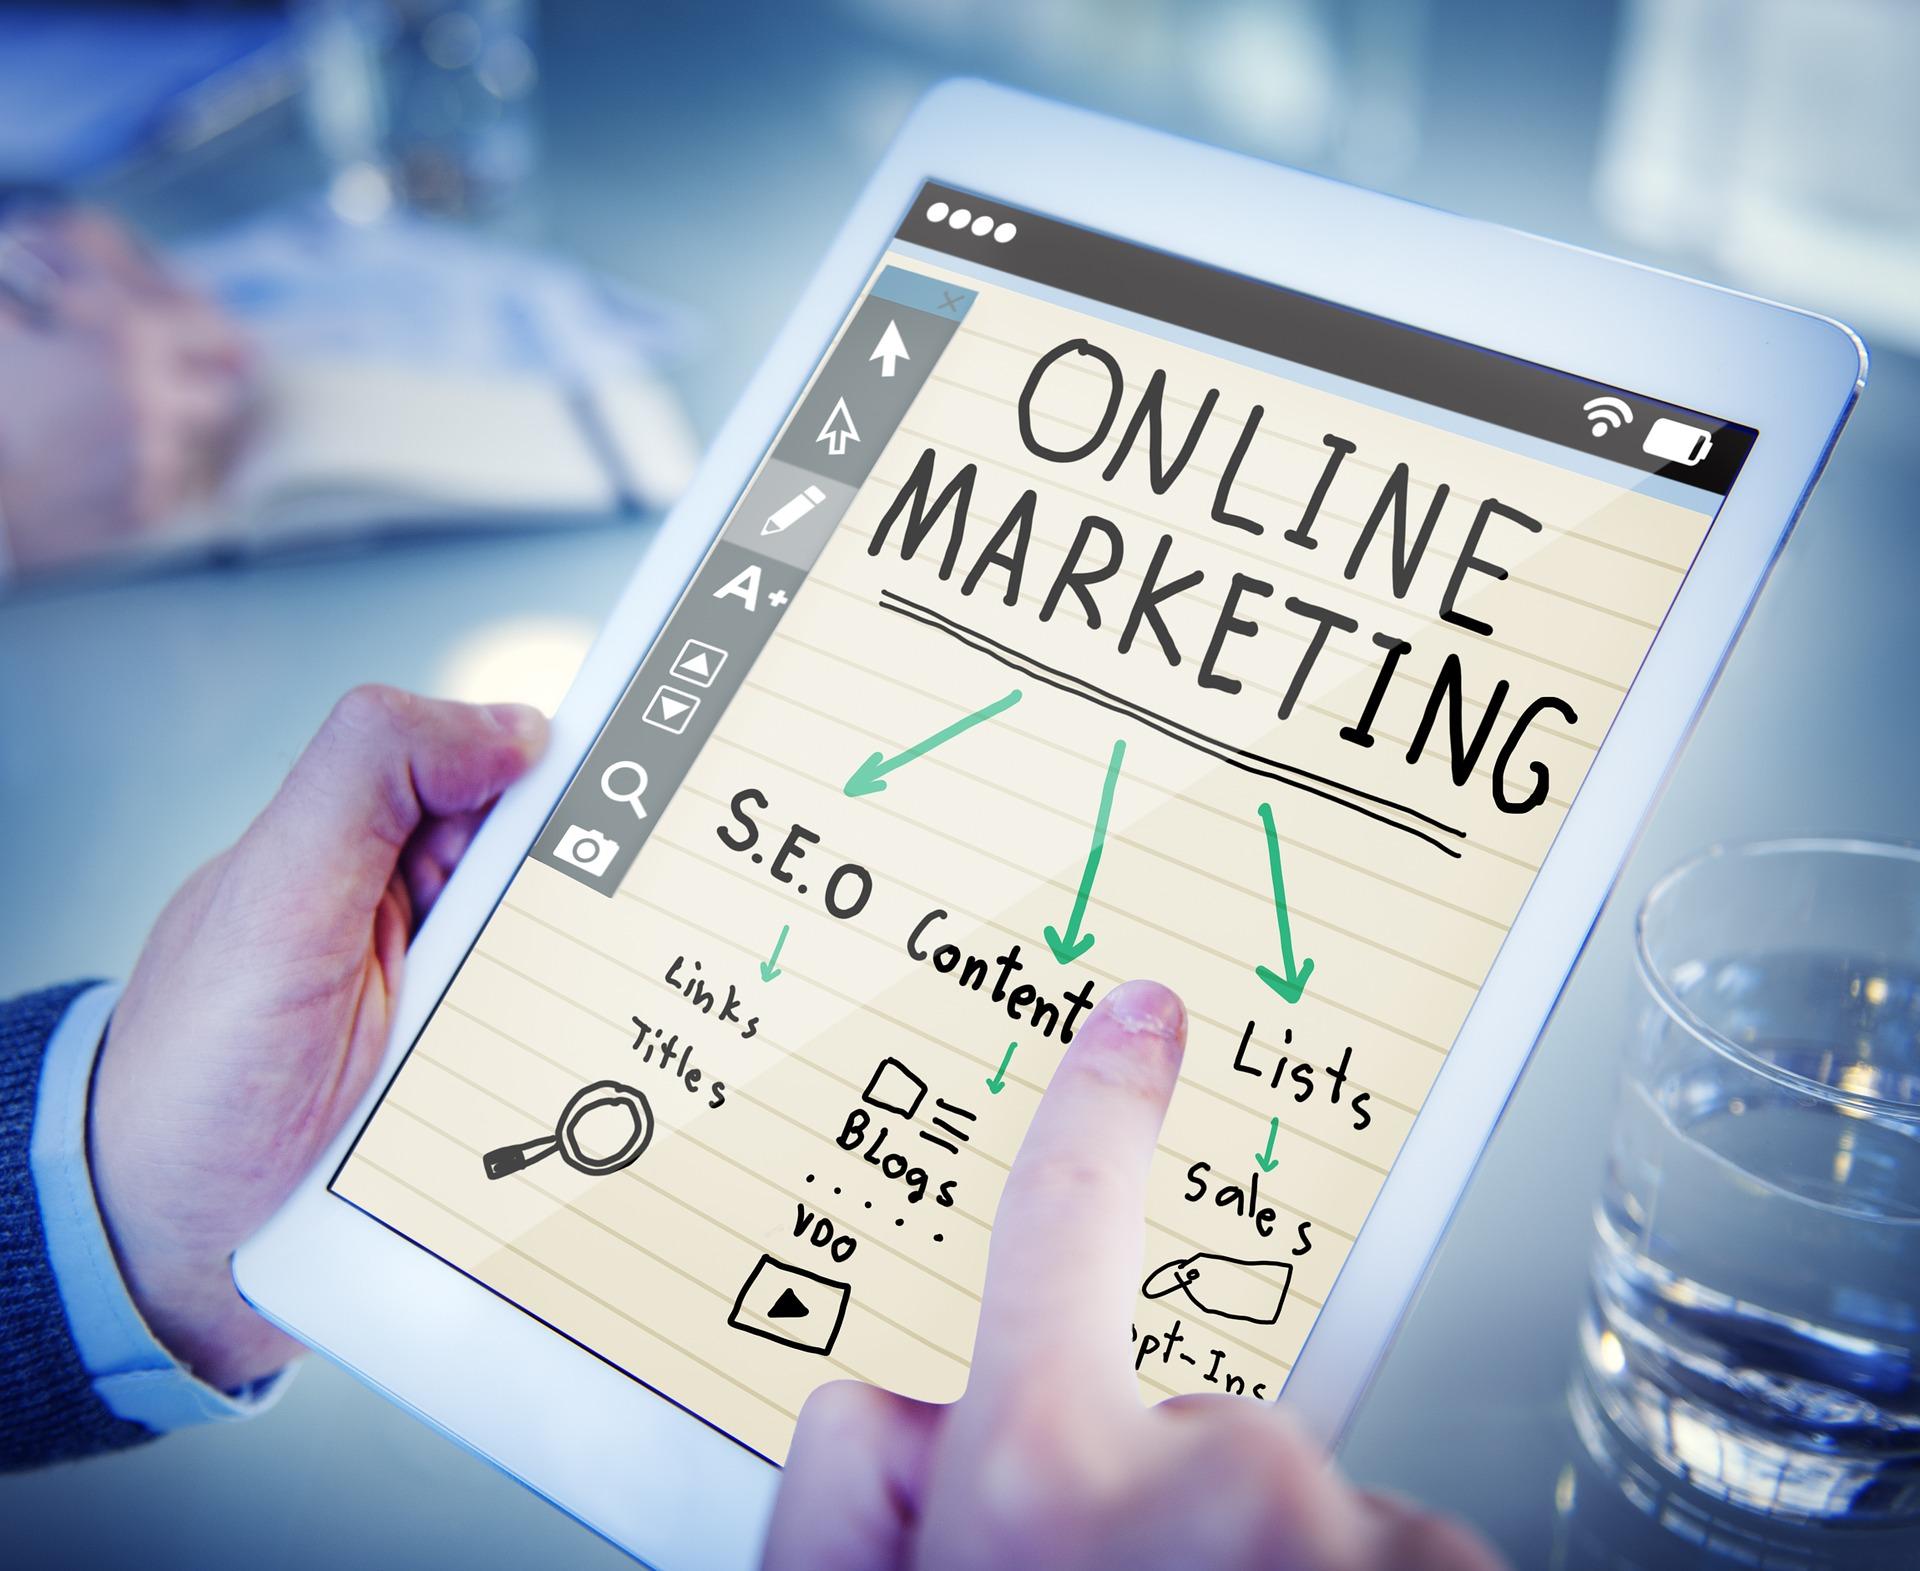 Whitevox Digital Marketing services